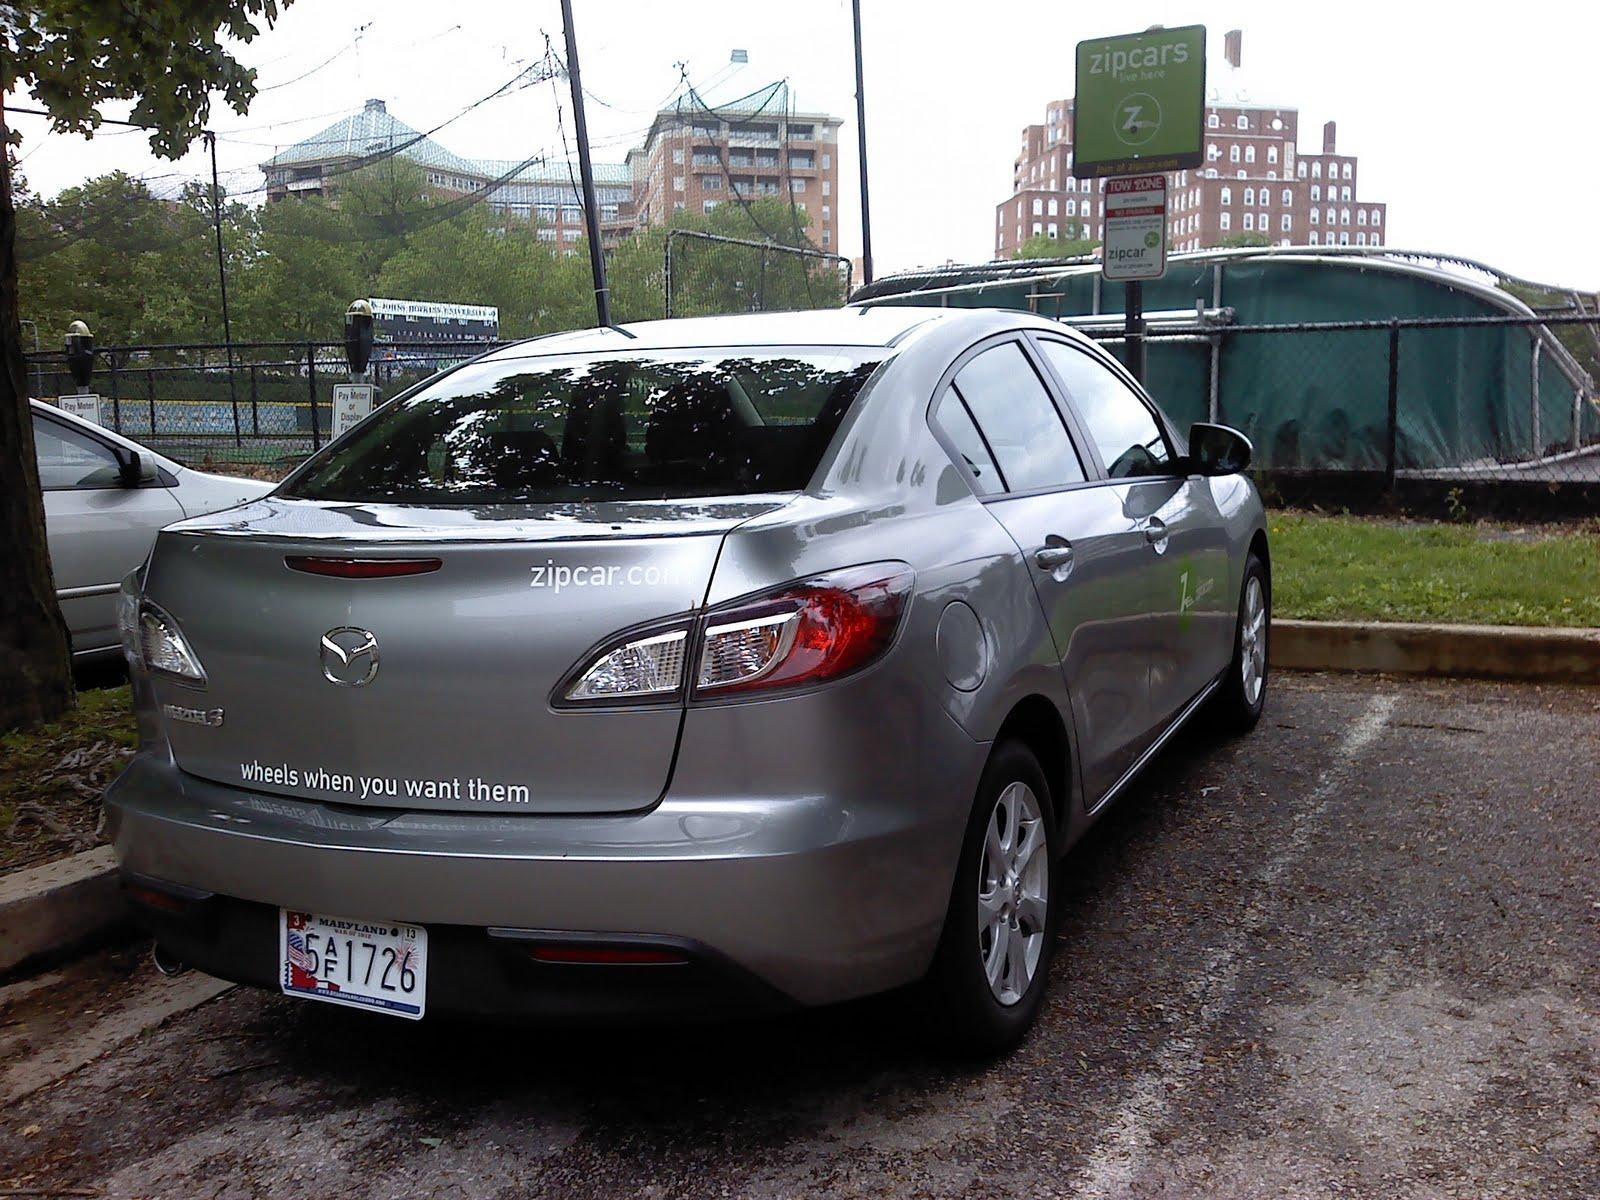 Mazda 3 BL 2010. 09 August 2010 - 07:48 PM